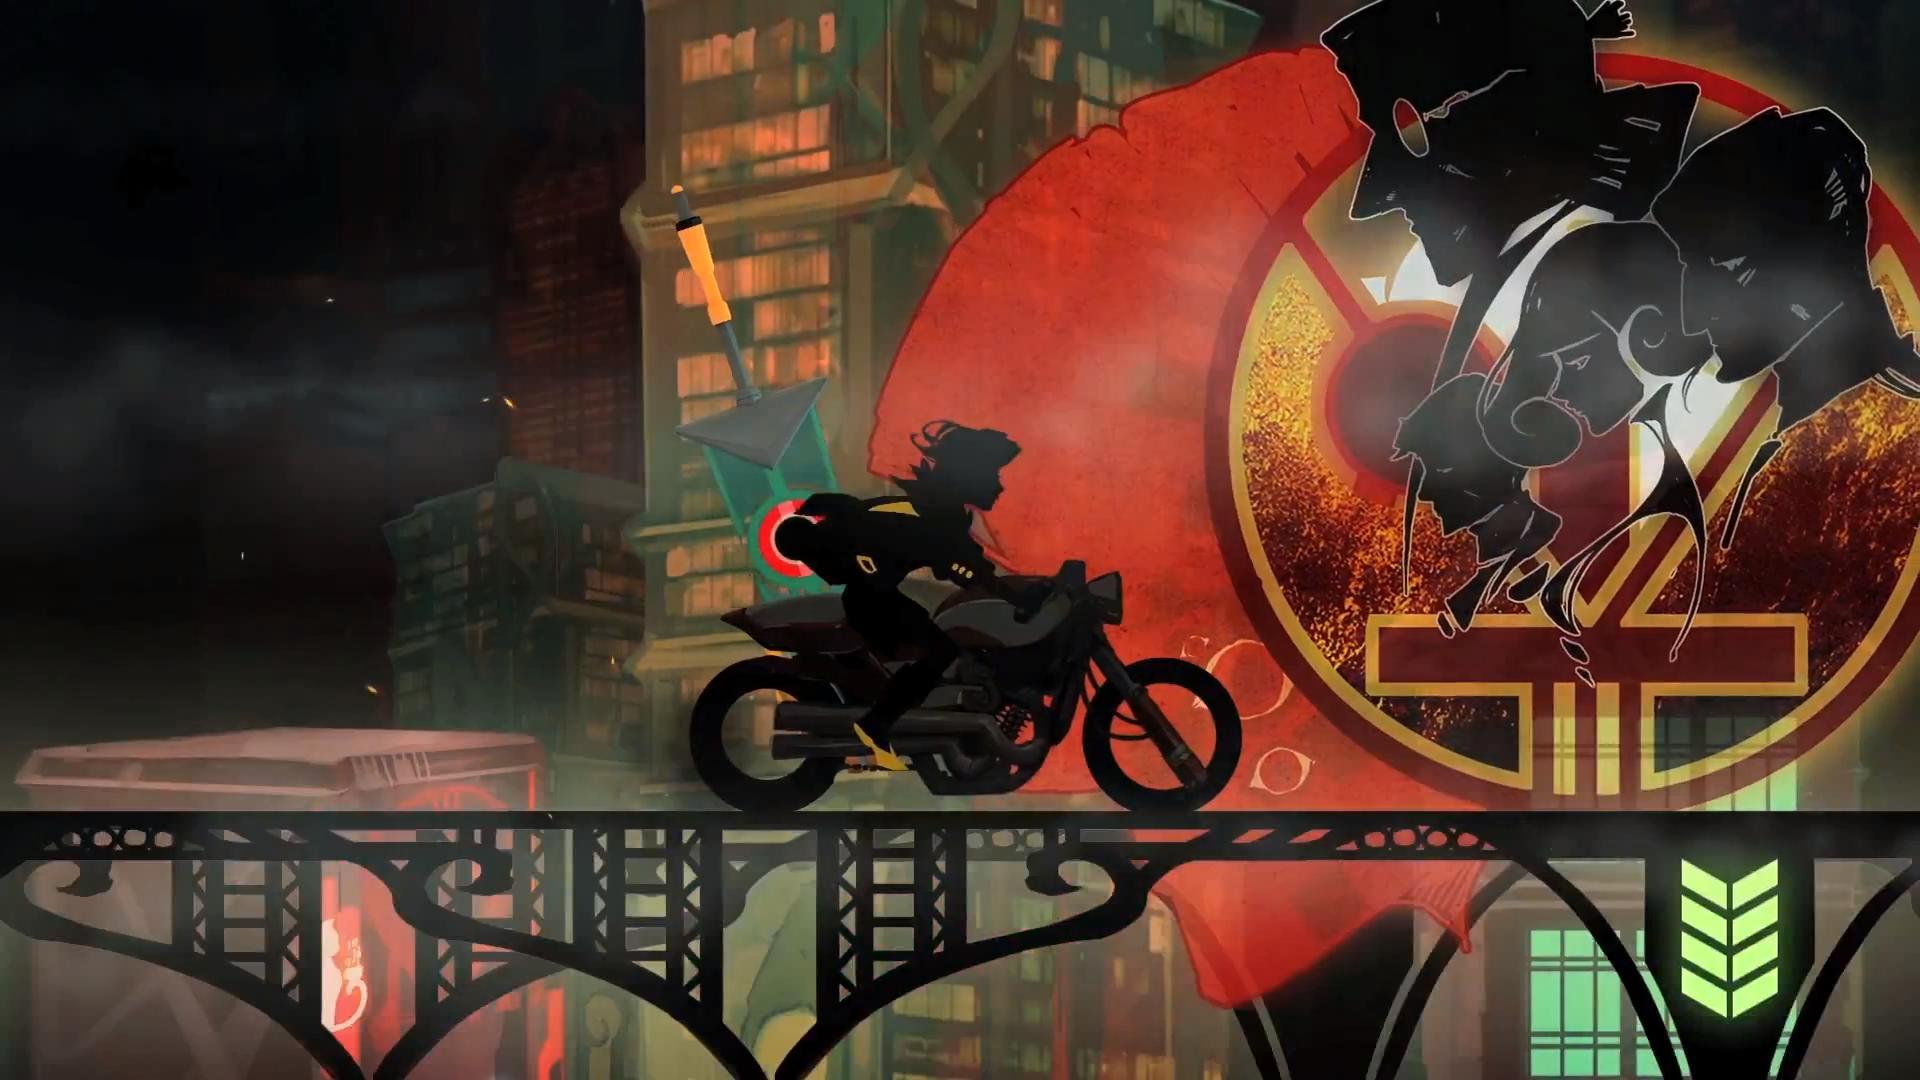 Transistor Game Anime W Wallpaper 1920x1080 169822 Wallpaperup